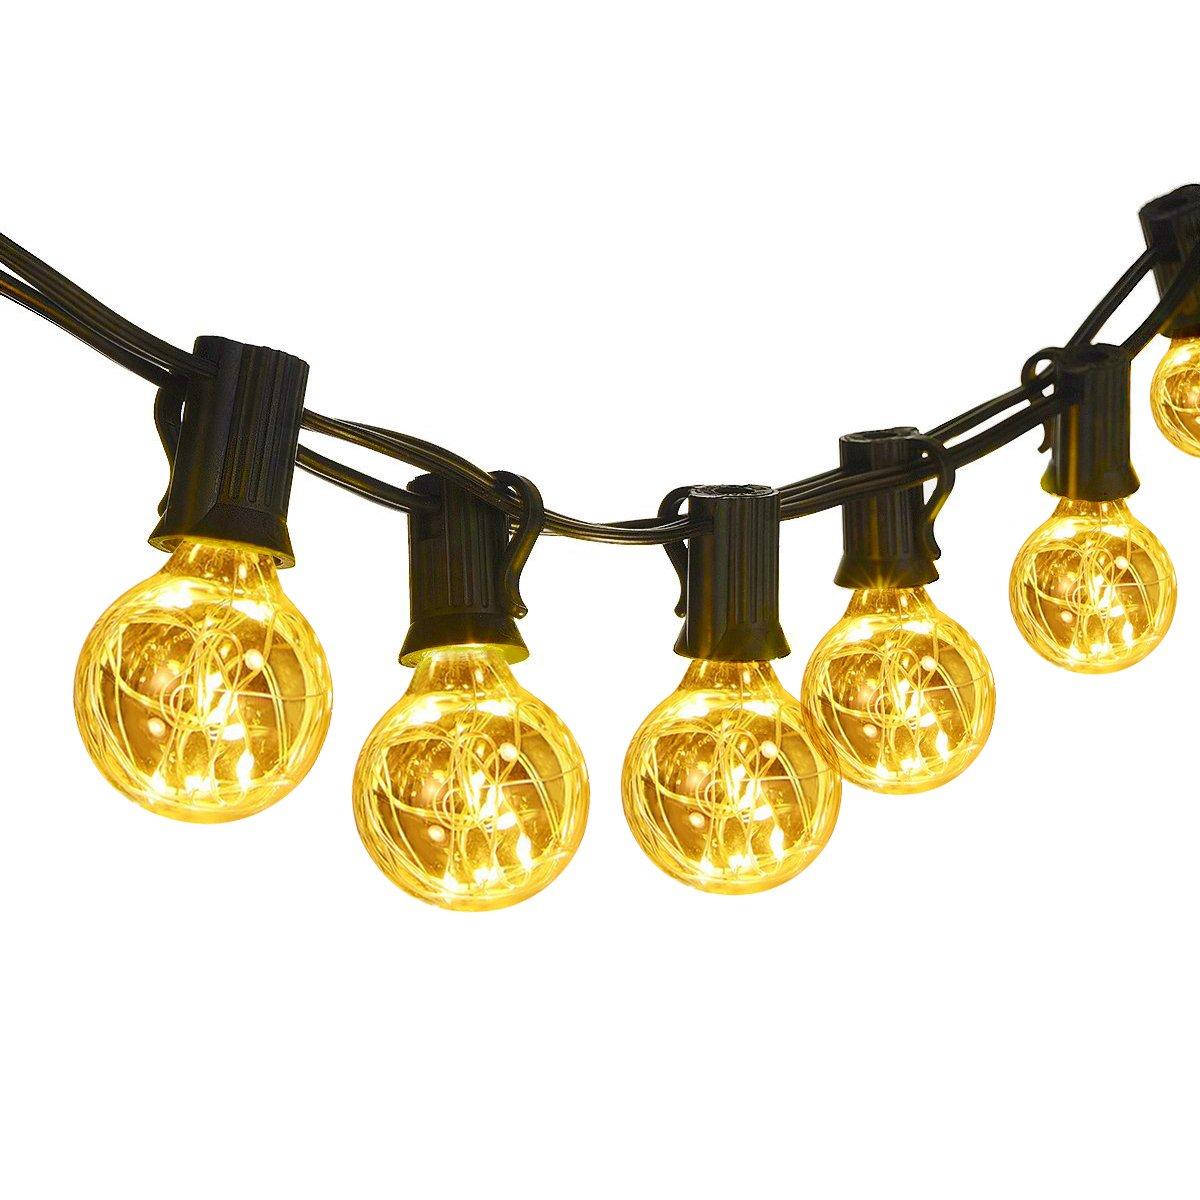 Classyke 25ft G40 LED Globe String Lights for Indoor Outdoor Patio Cafe Bistro Deck Party Wedding Gazebo Backyard Bedroom Weatherproof Linkable [UL Listed]